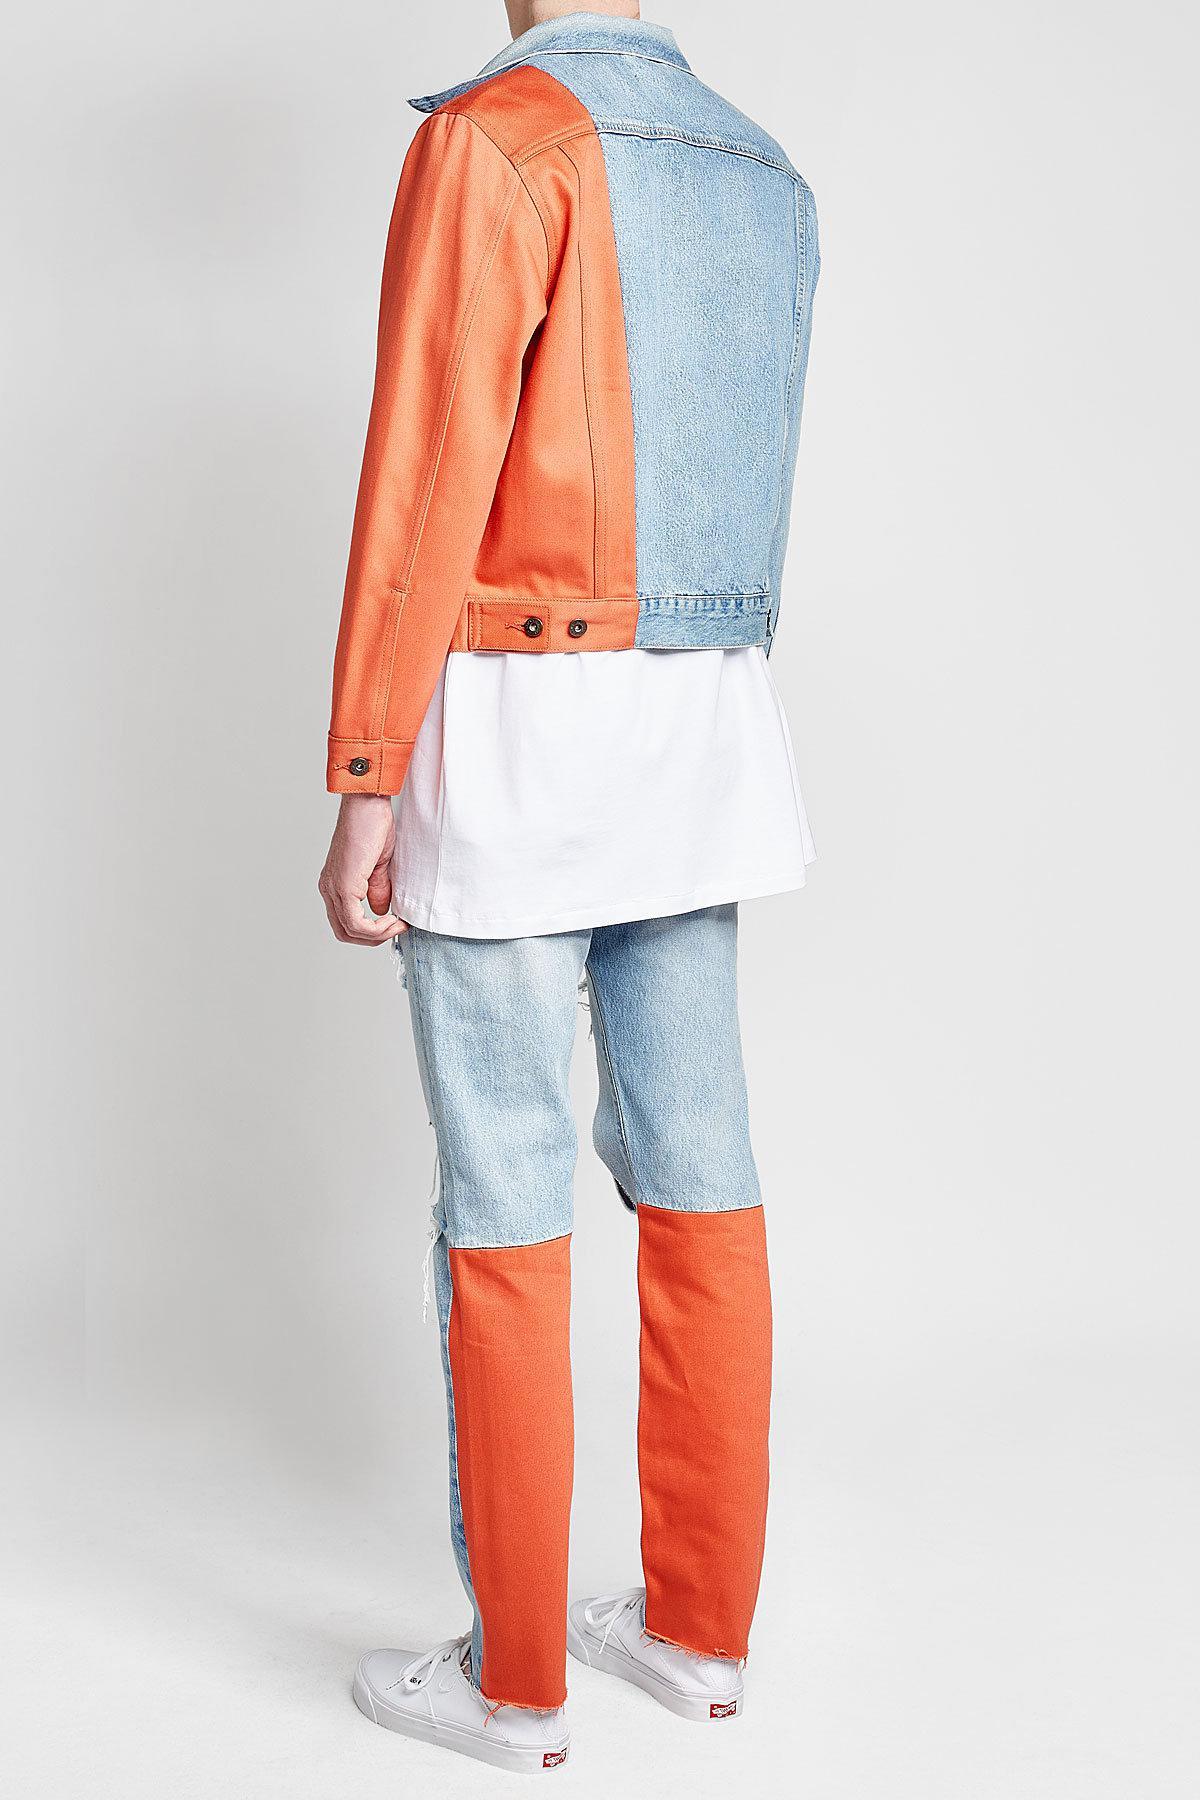 7924cb2a1 Off-White c/o Virgil Abloh Blue X Levi's Splice Trucker Denim Jacket With  Contrast Sleeve